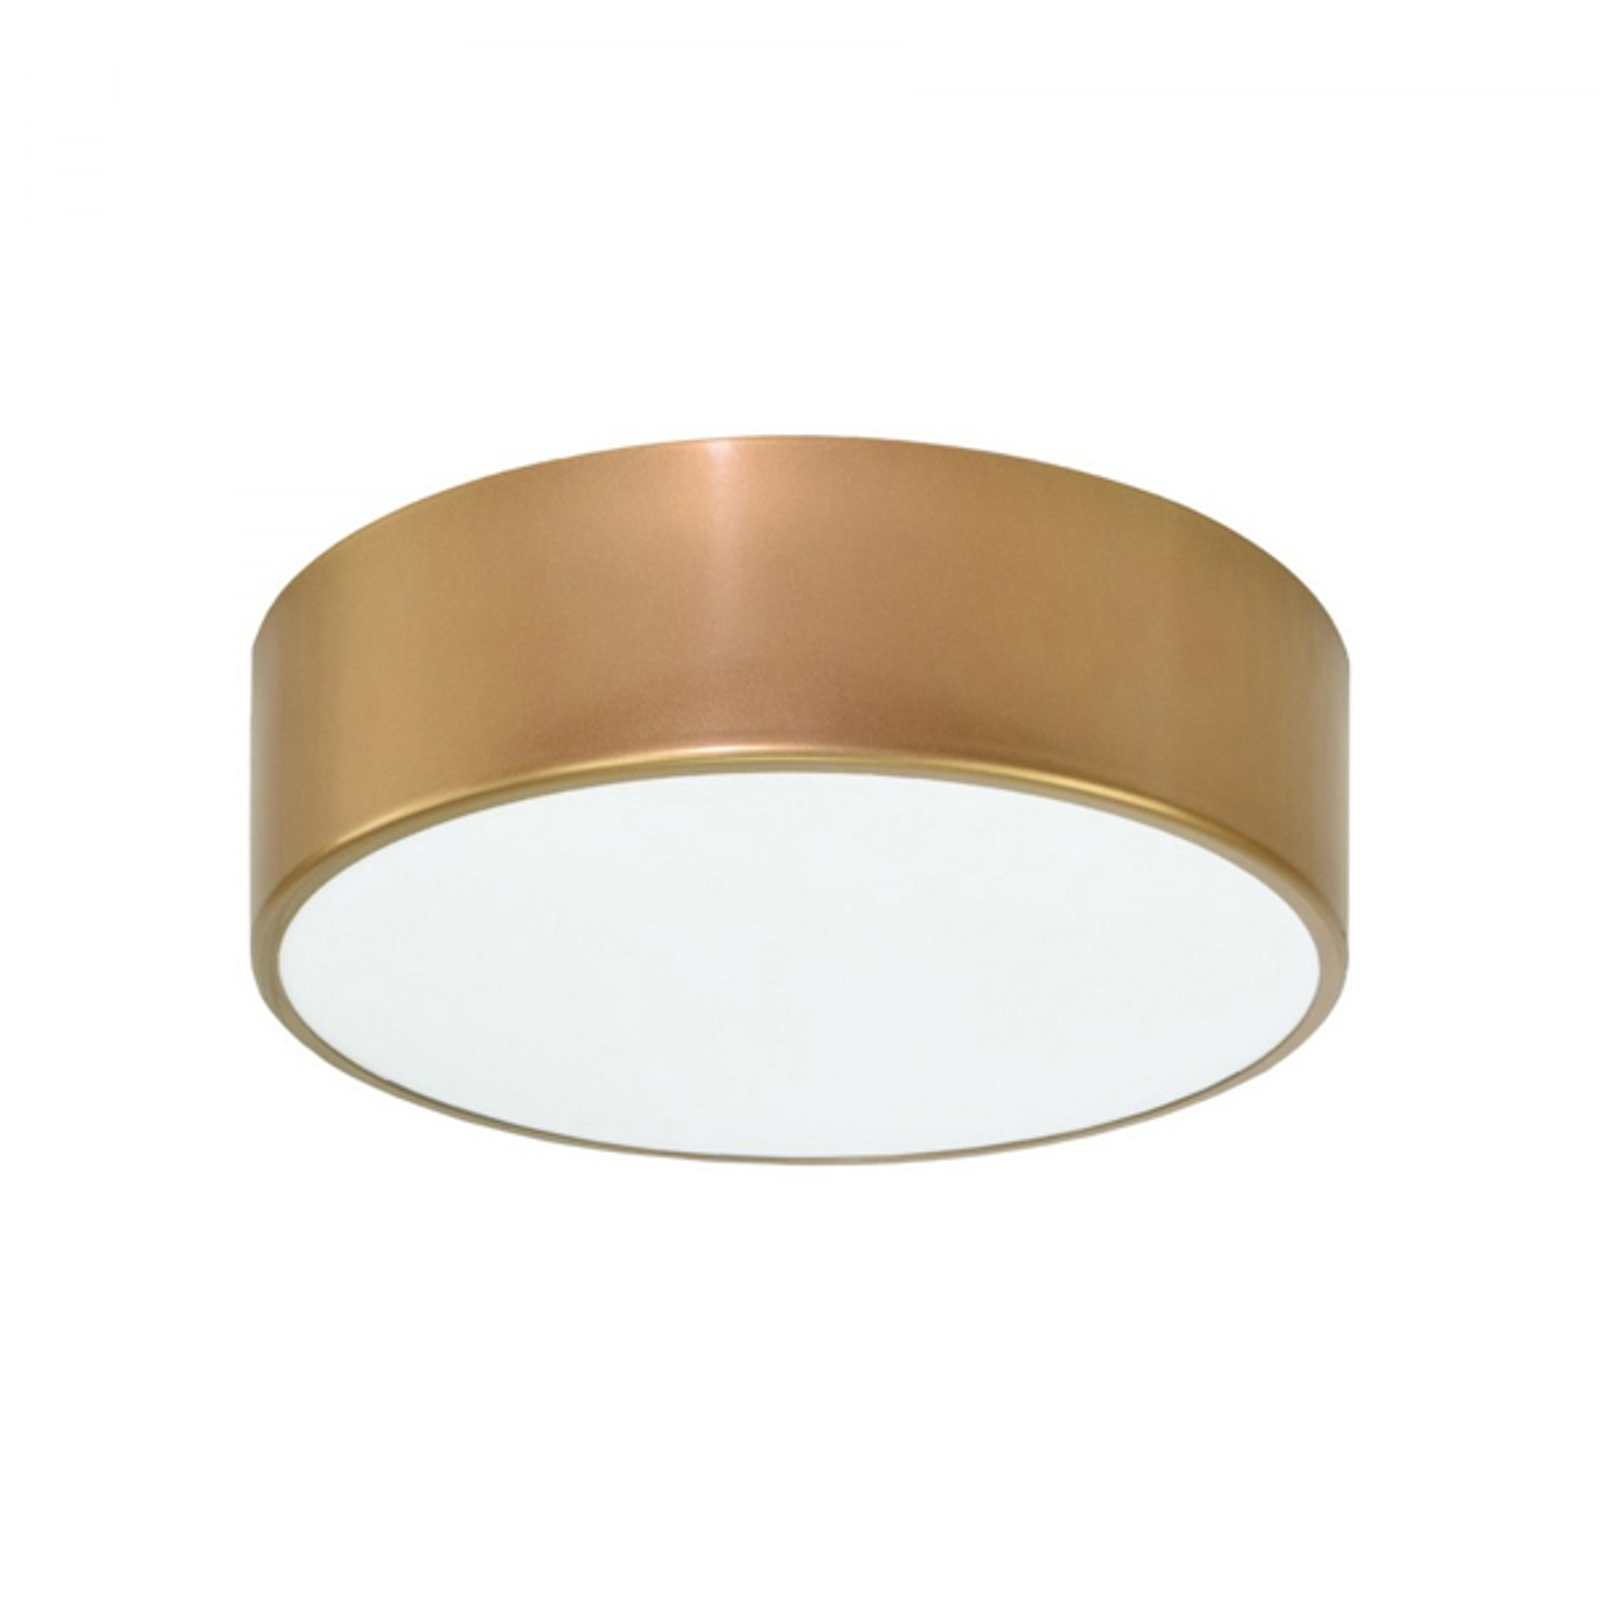 Cleo loftlampe, Ø 20 cm, guld